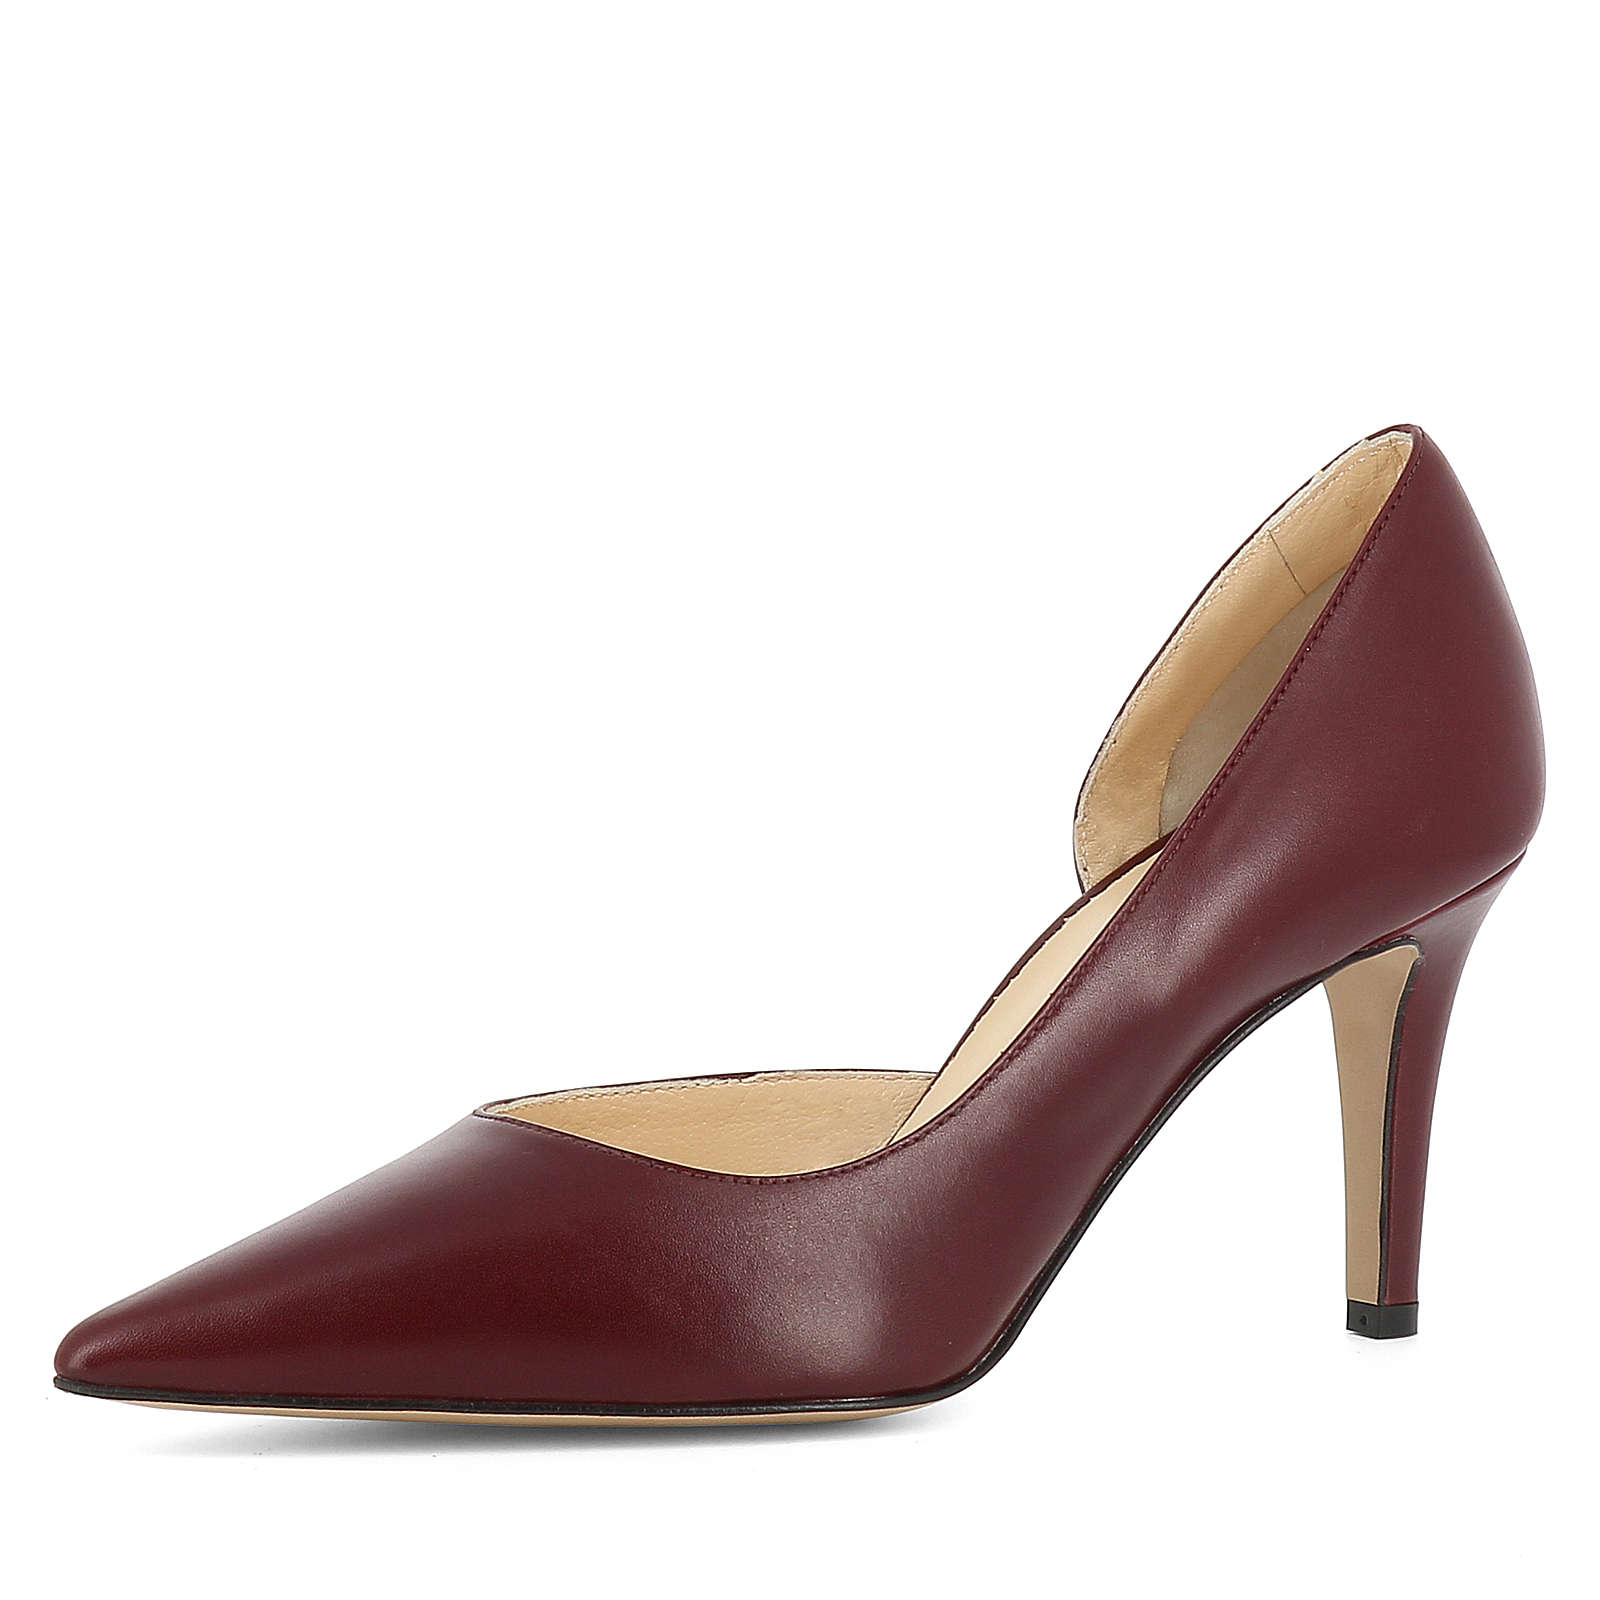 Evita Shoes JESSICA Klassische Pumps dunkelrot Damen Gr. 40